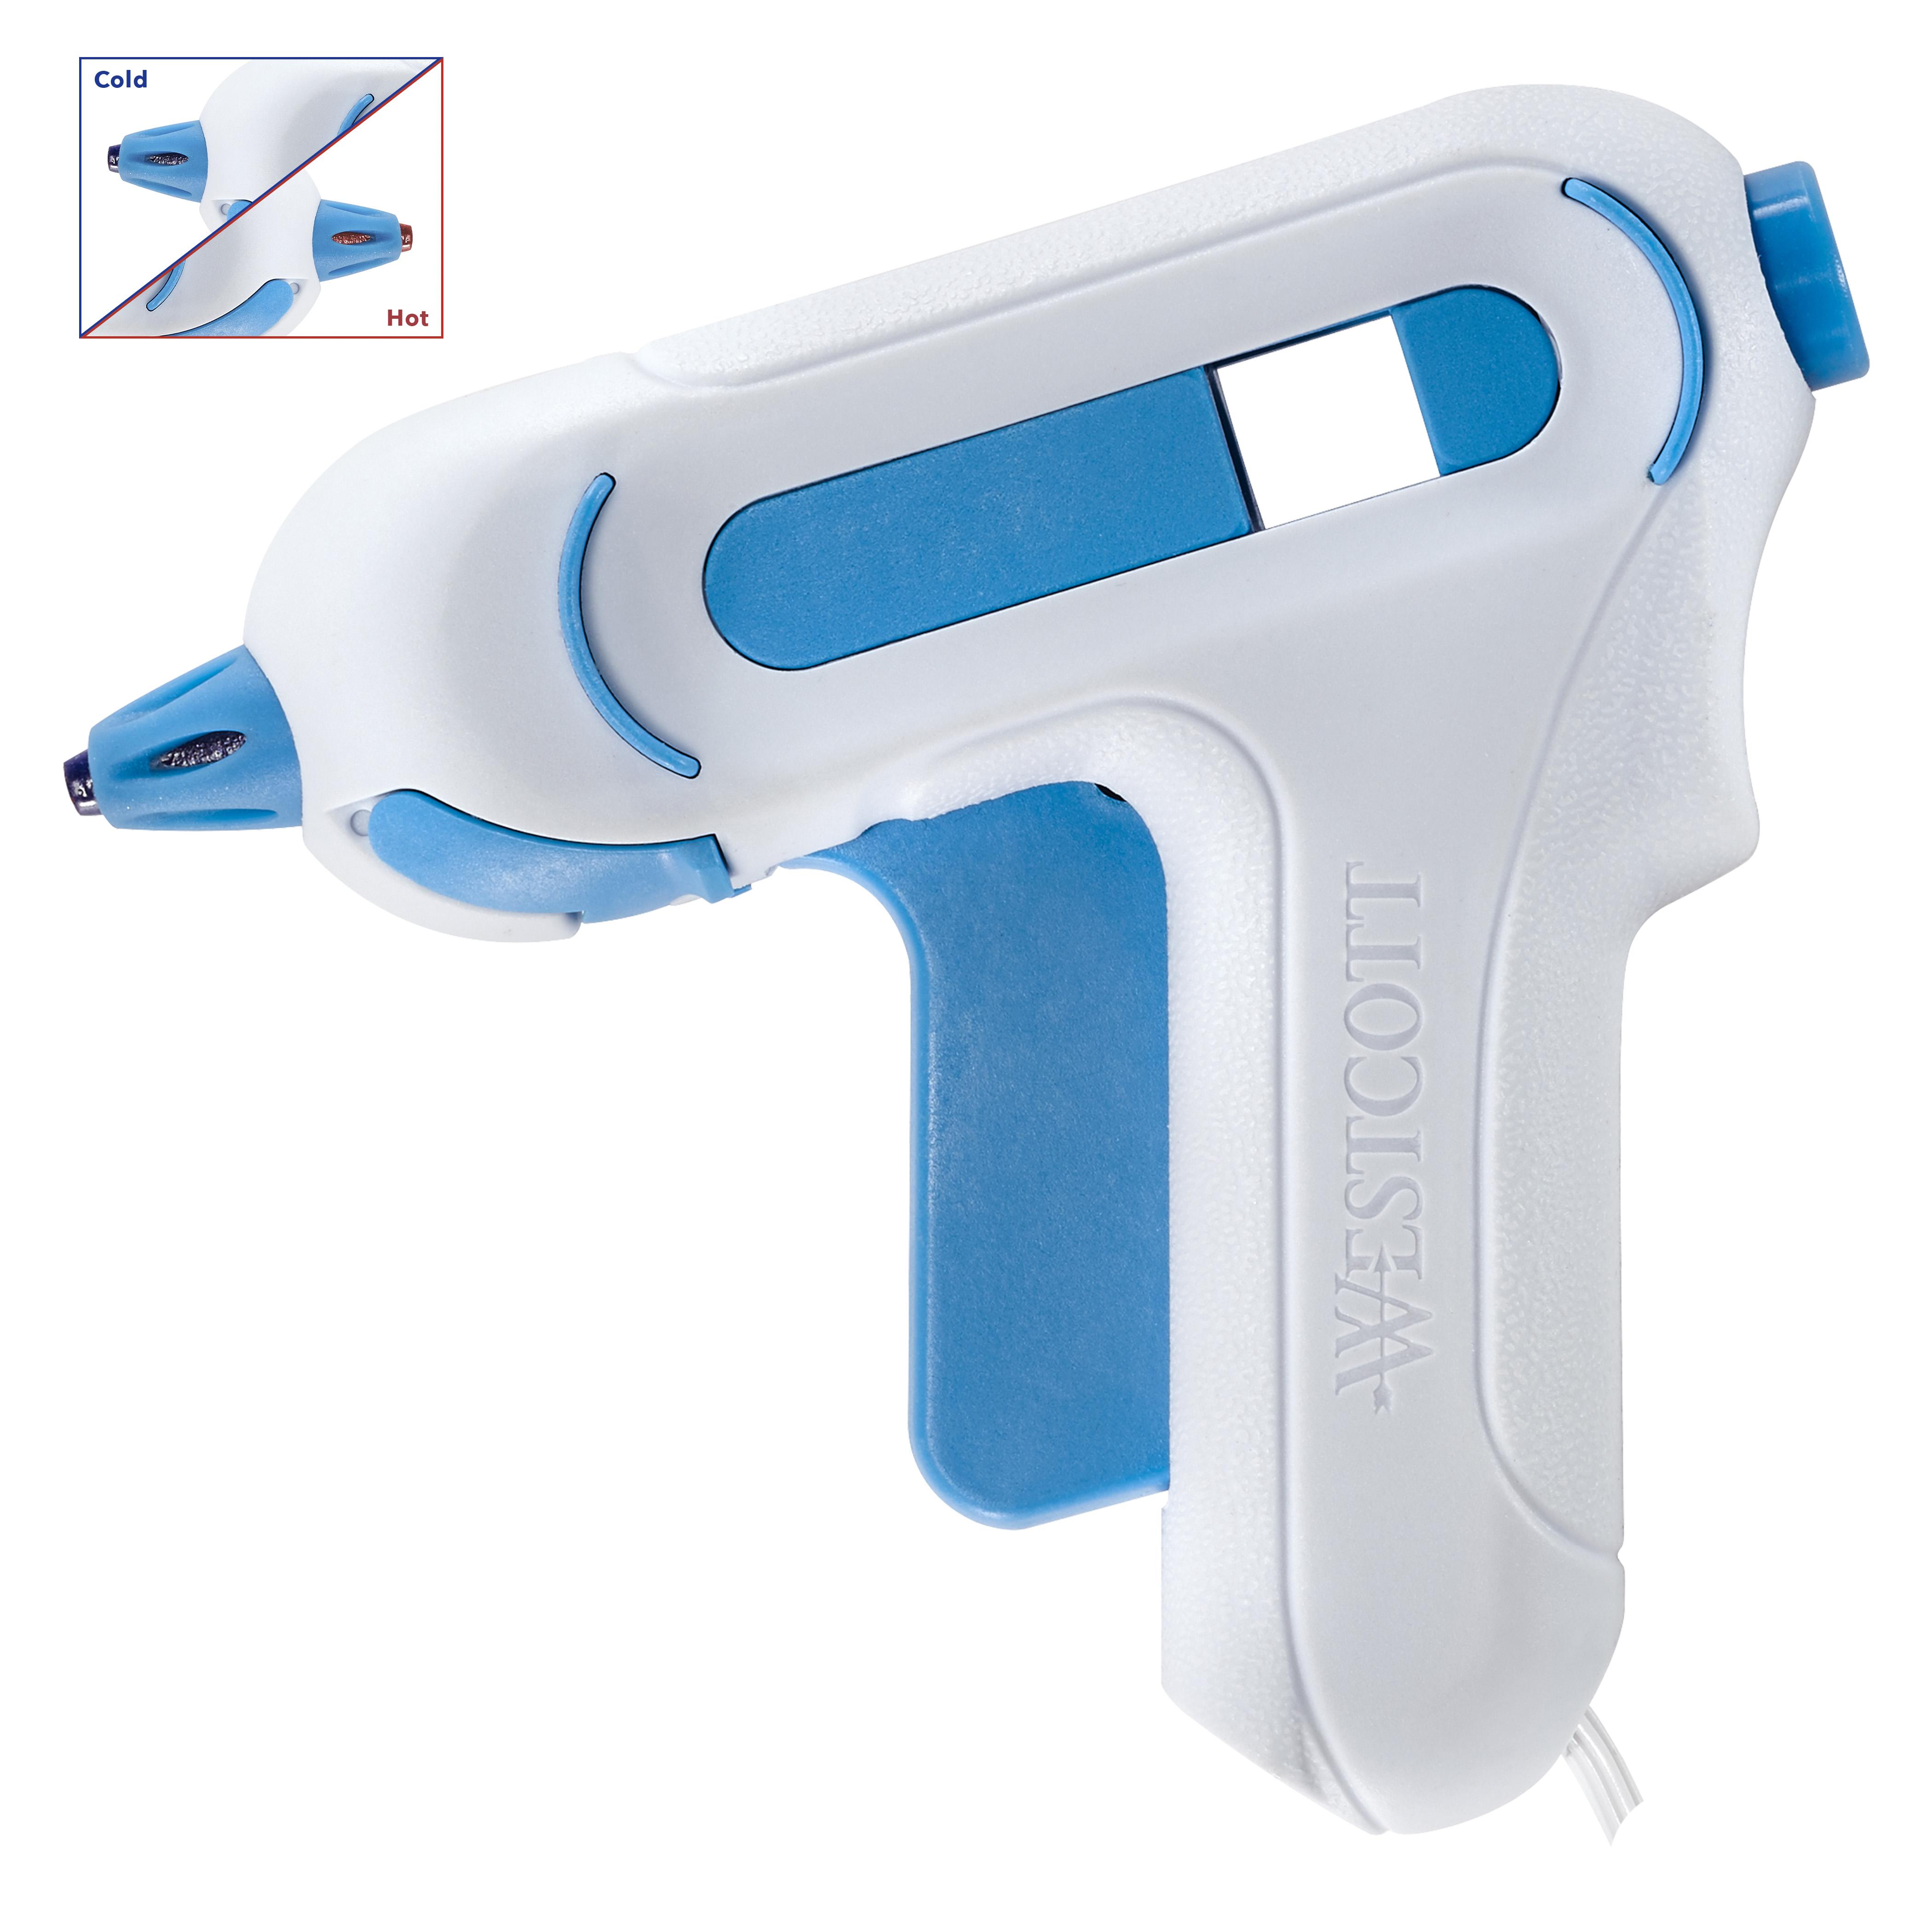 Westcott Premium Safety Mini Hot Glue Gun, High Temp (16758)